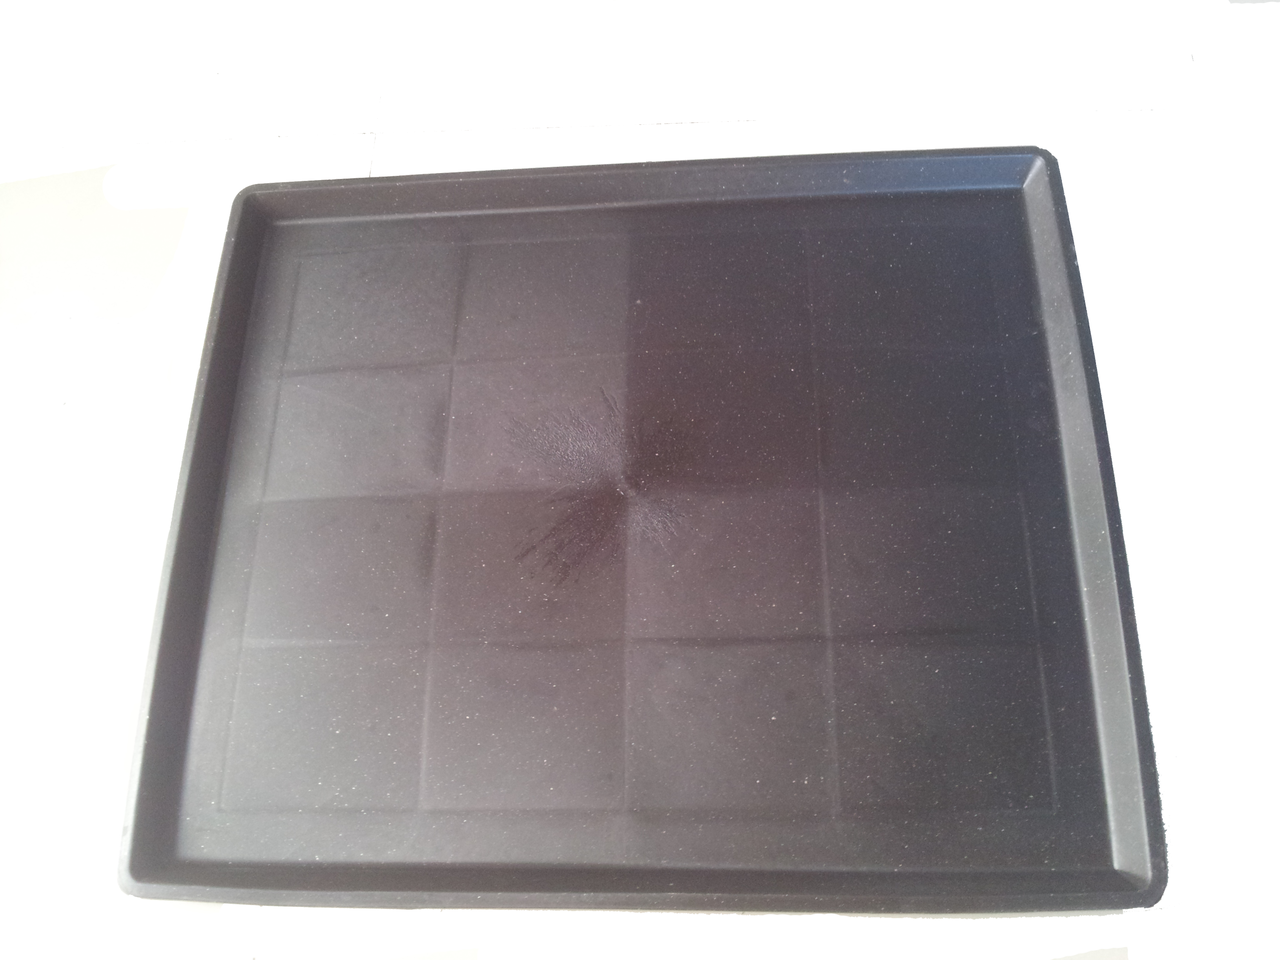 Поддон пластиковый. 49х58х2,5 Пластиковые поддоны для клеток.